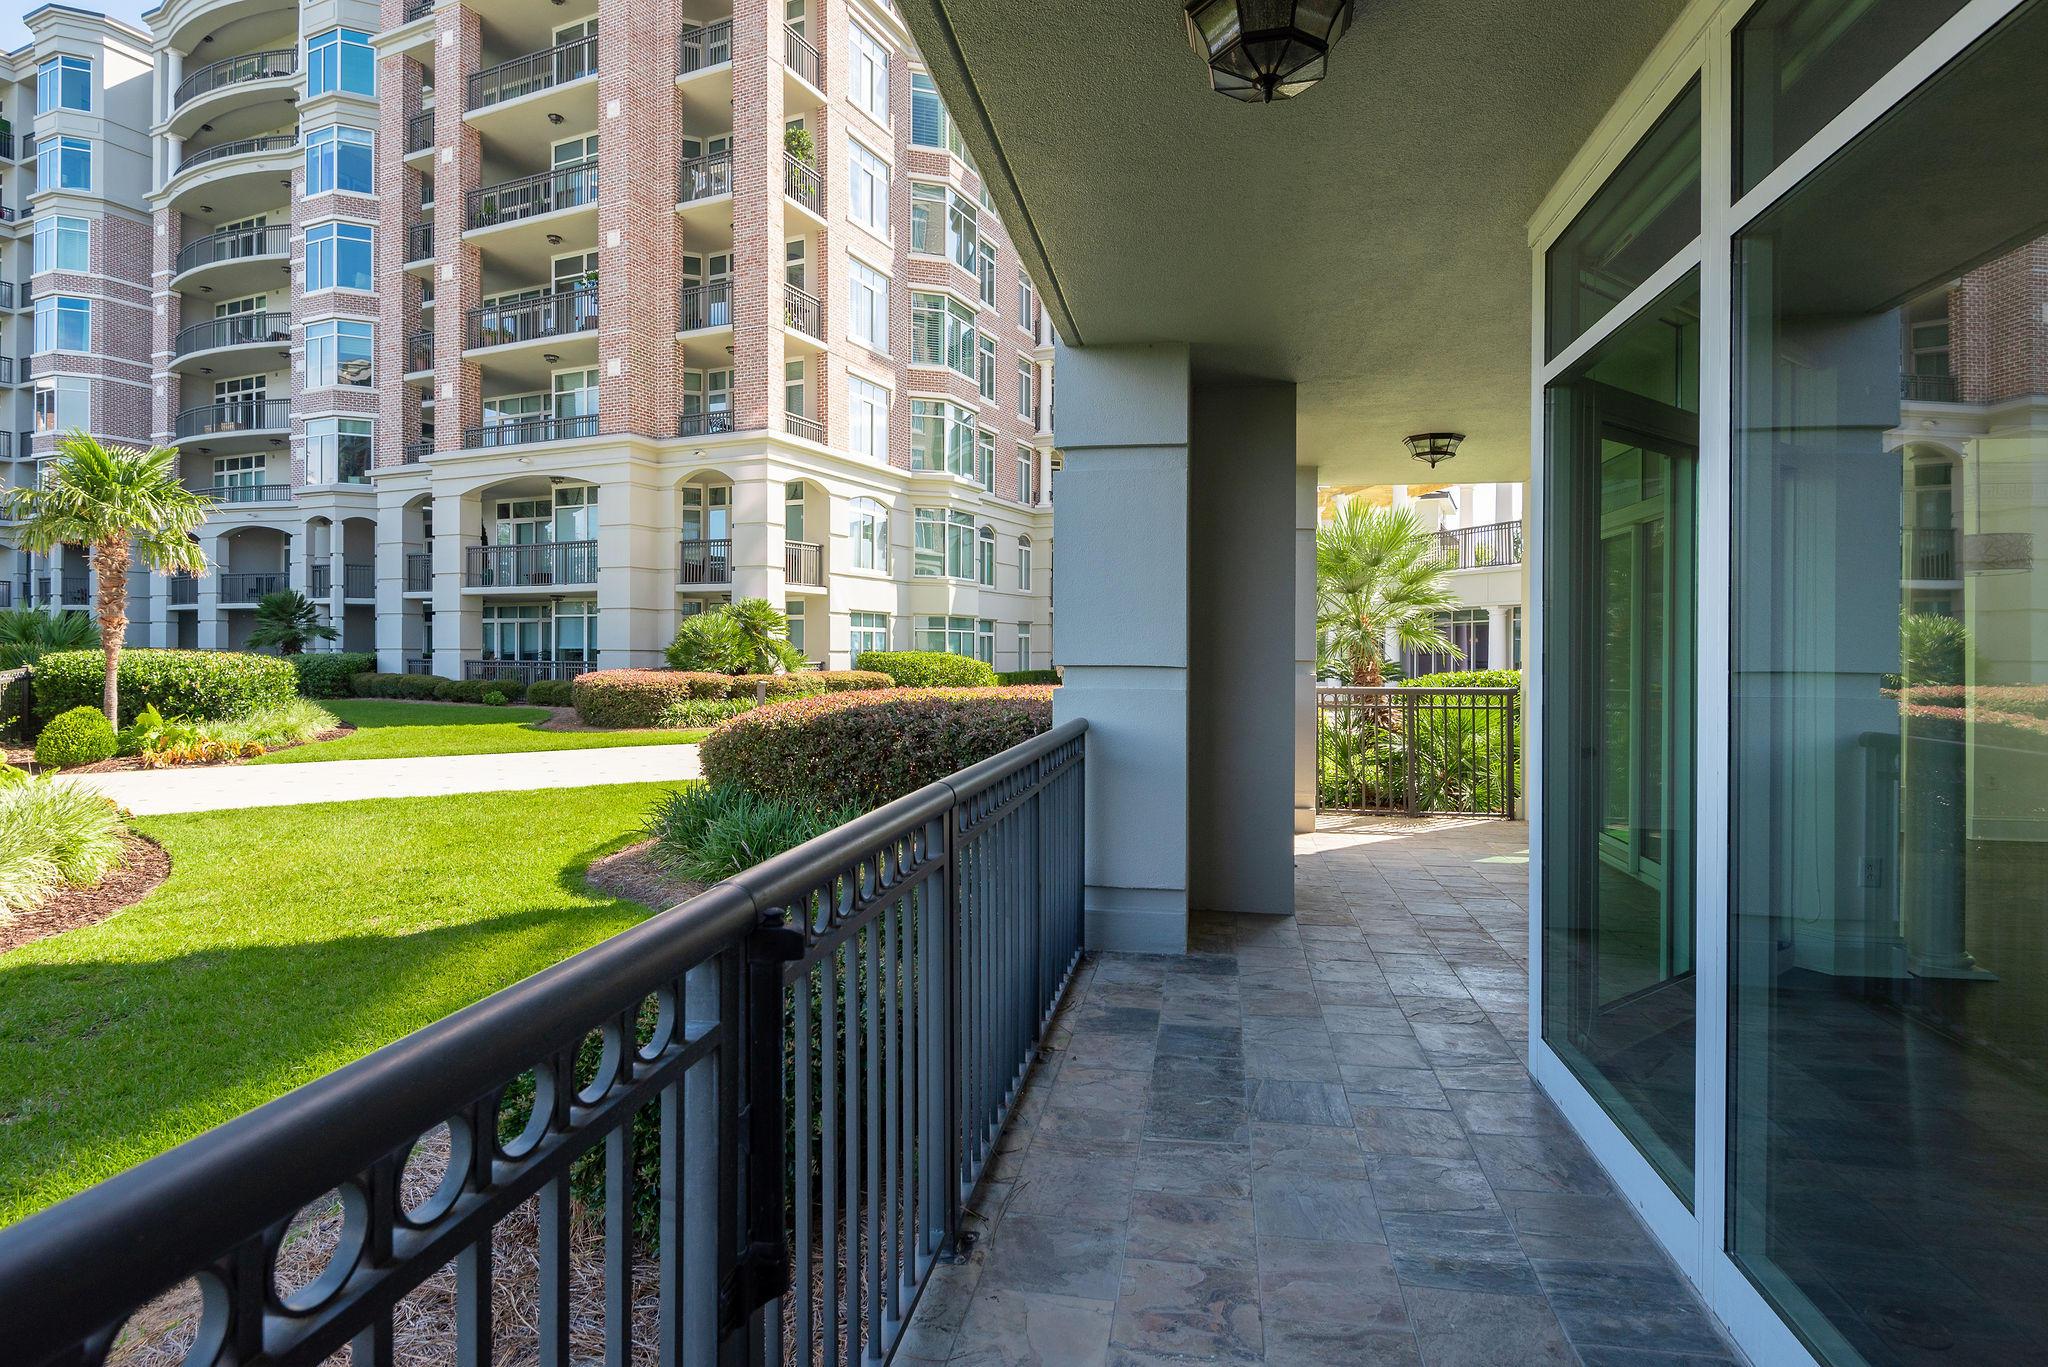 Renaissance On Chas Harbor Homes For Sale - 211 Plaza, Mount Pleasant, SC - 31